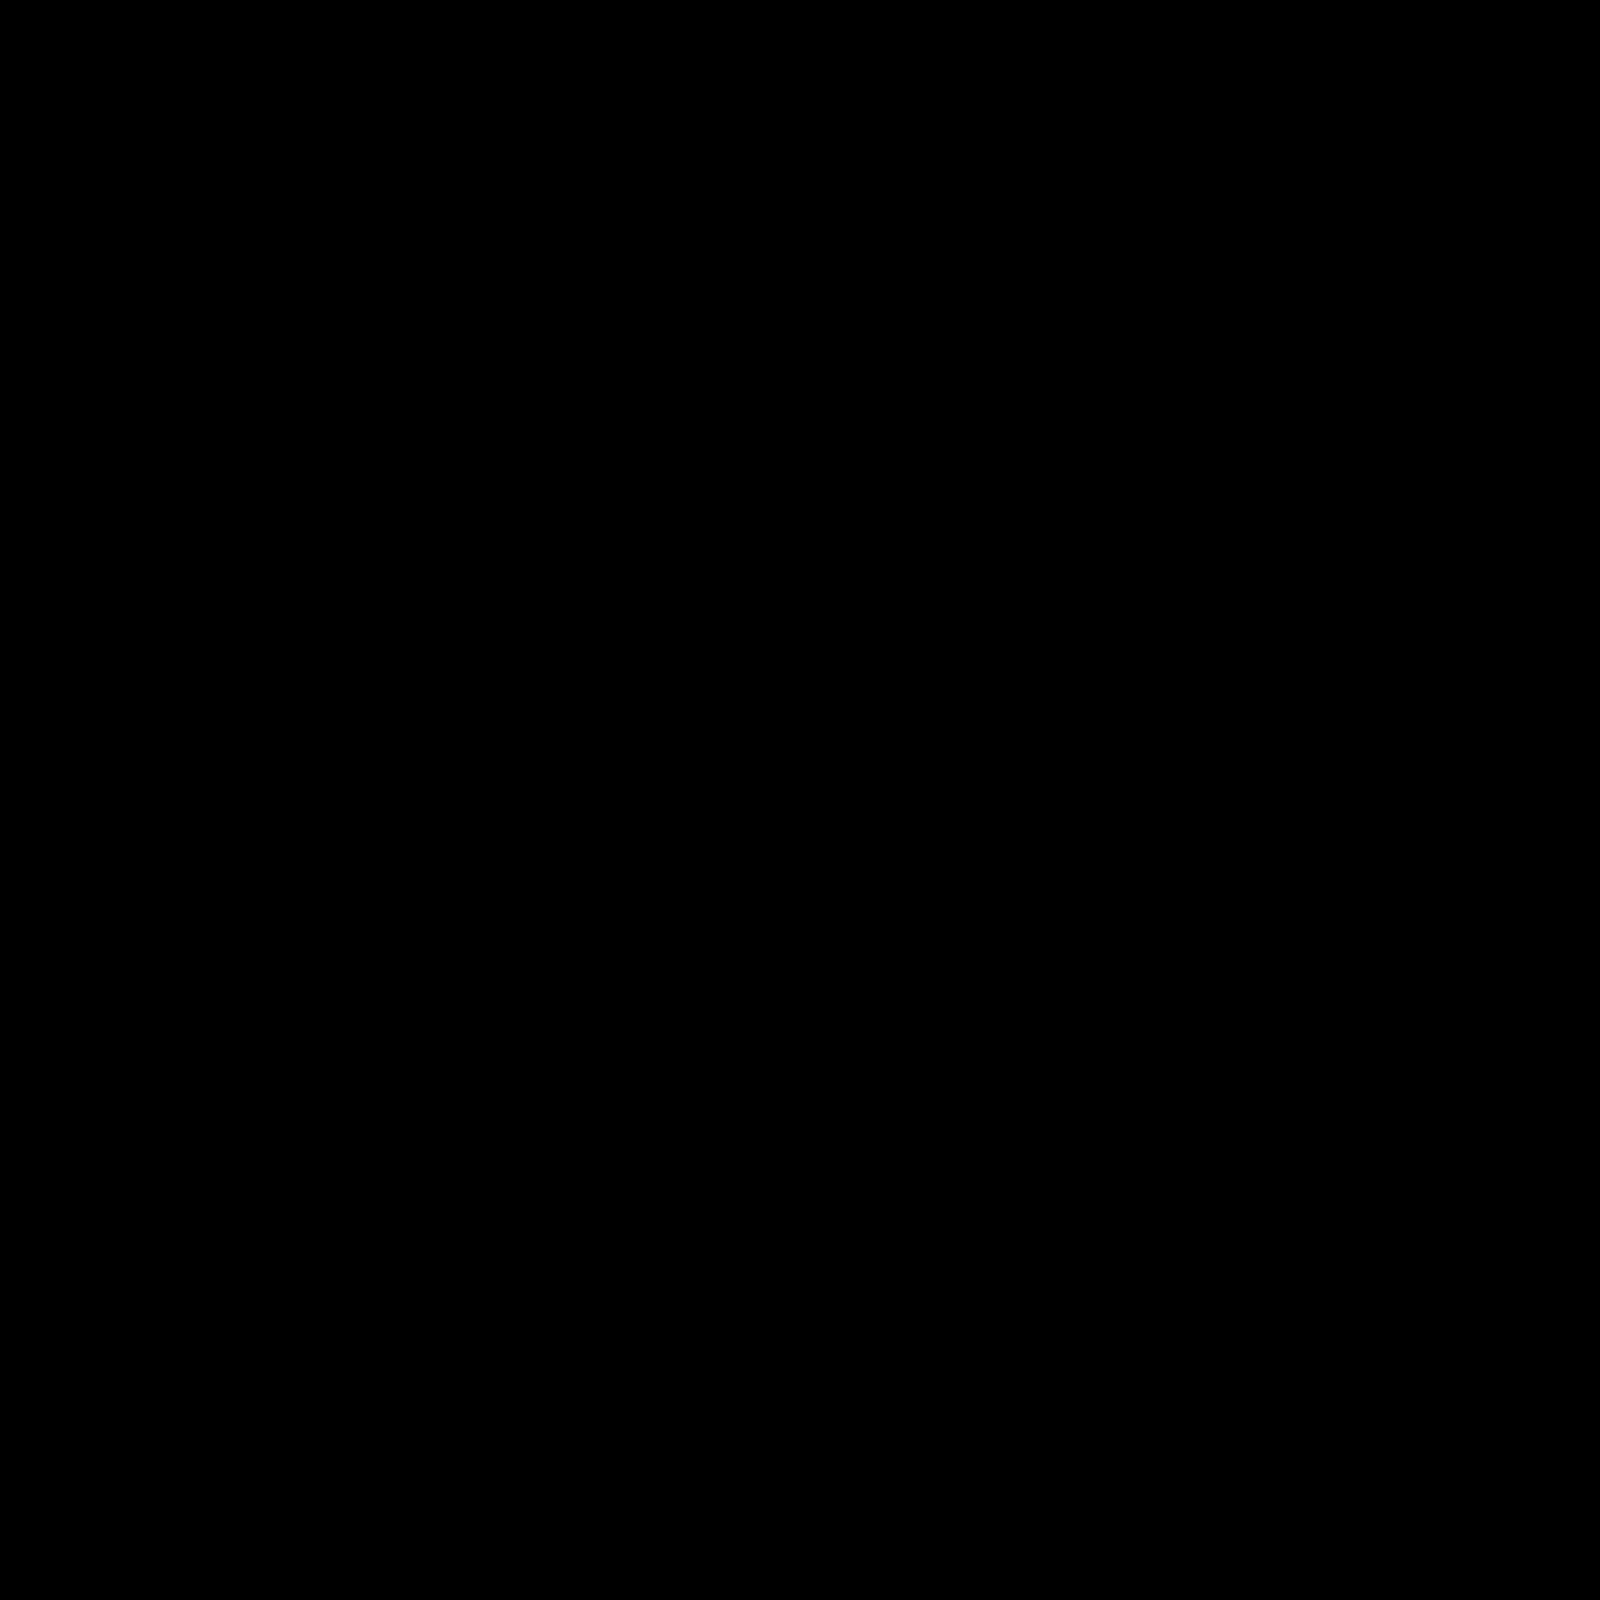 Lock Orientation icon